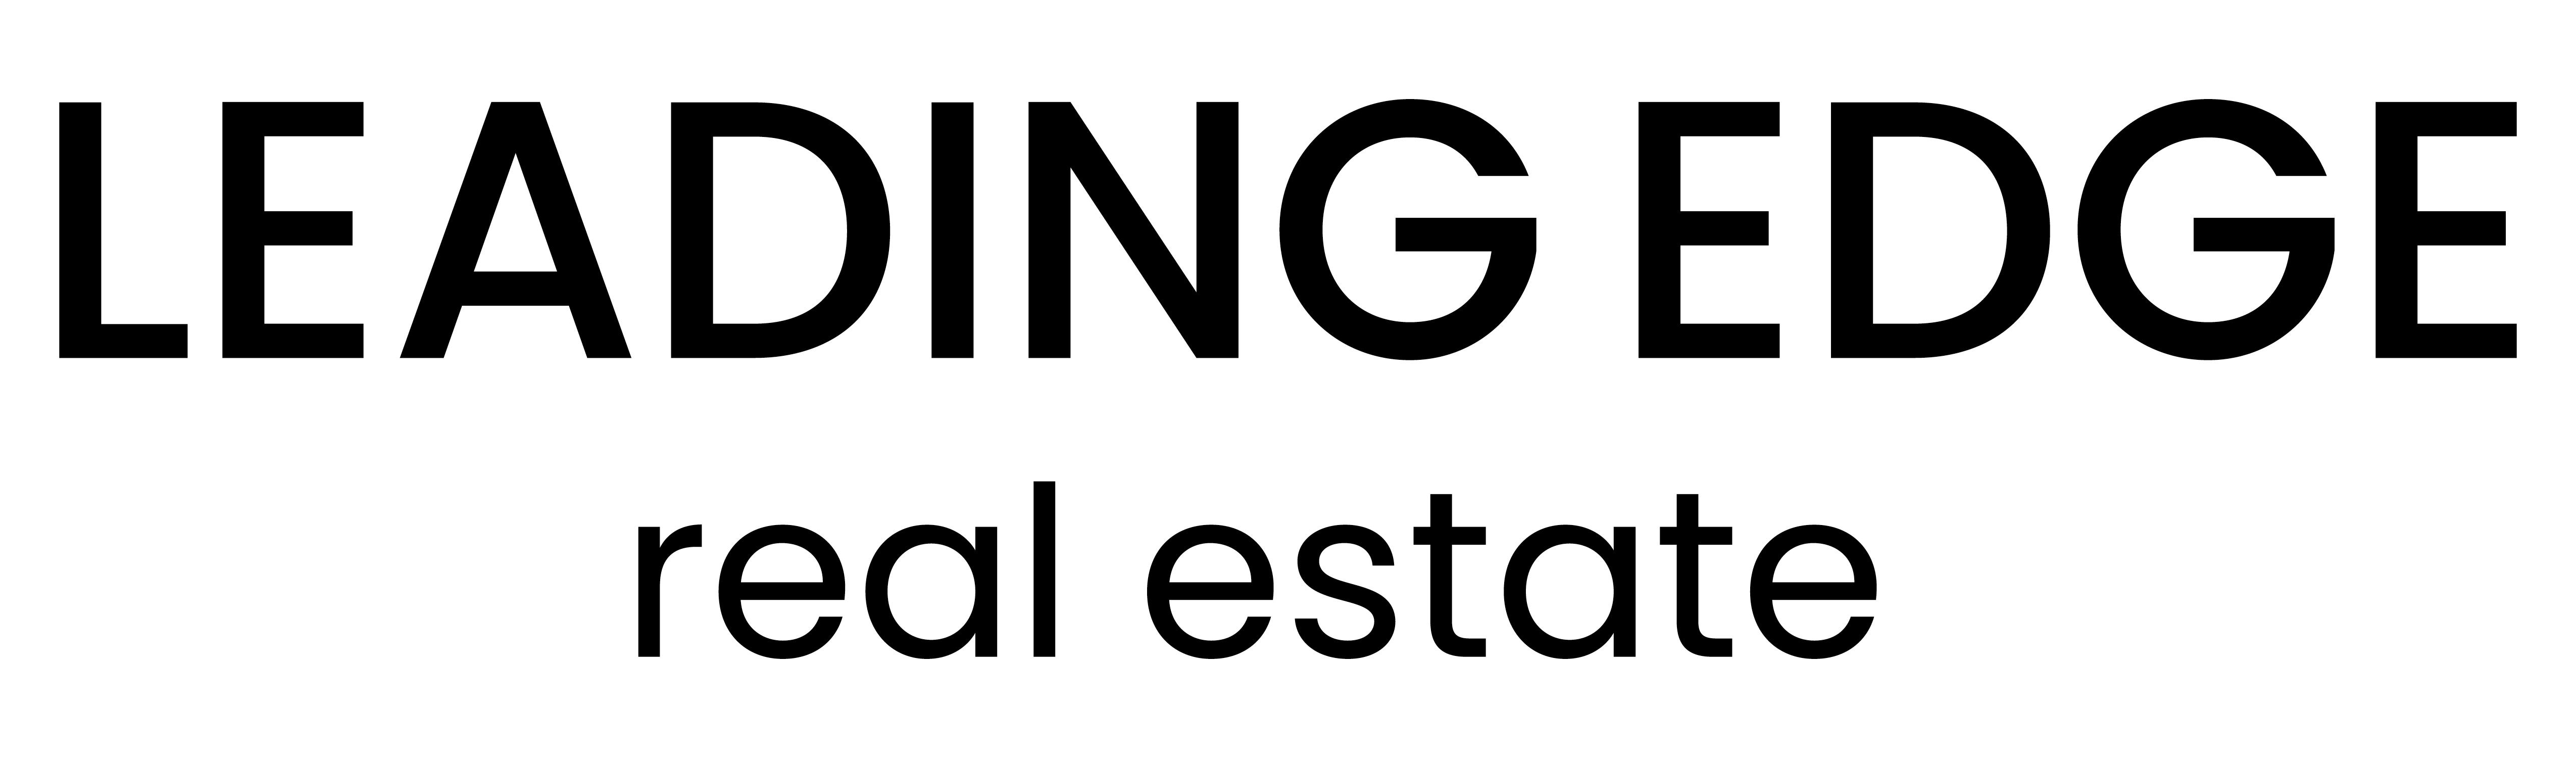 Leading Edge Real Estate logo